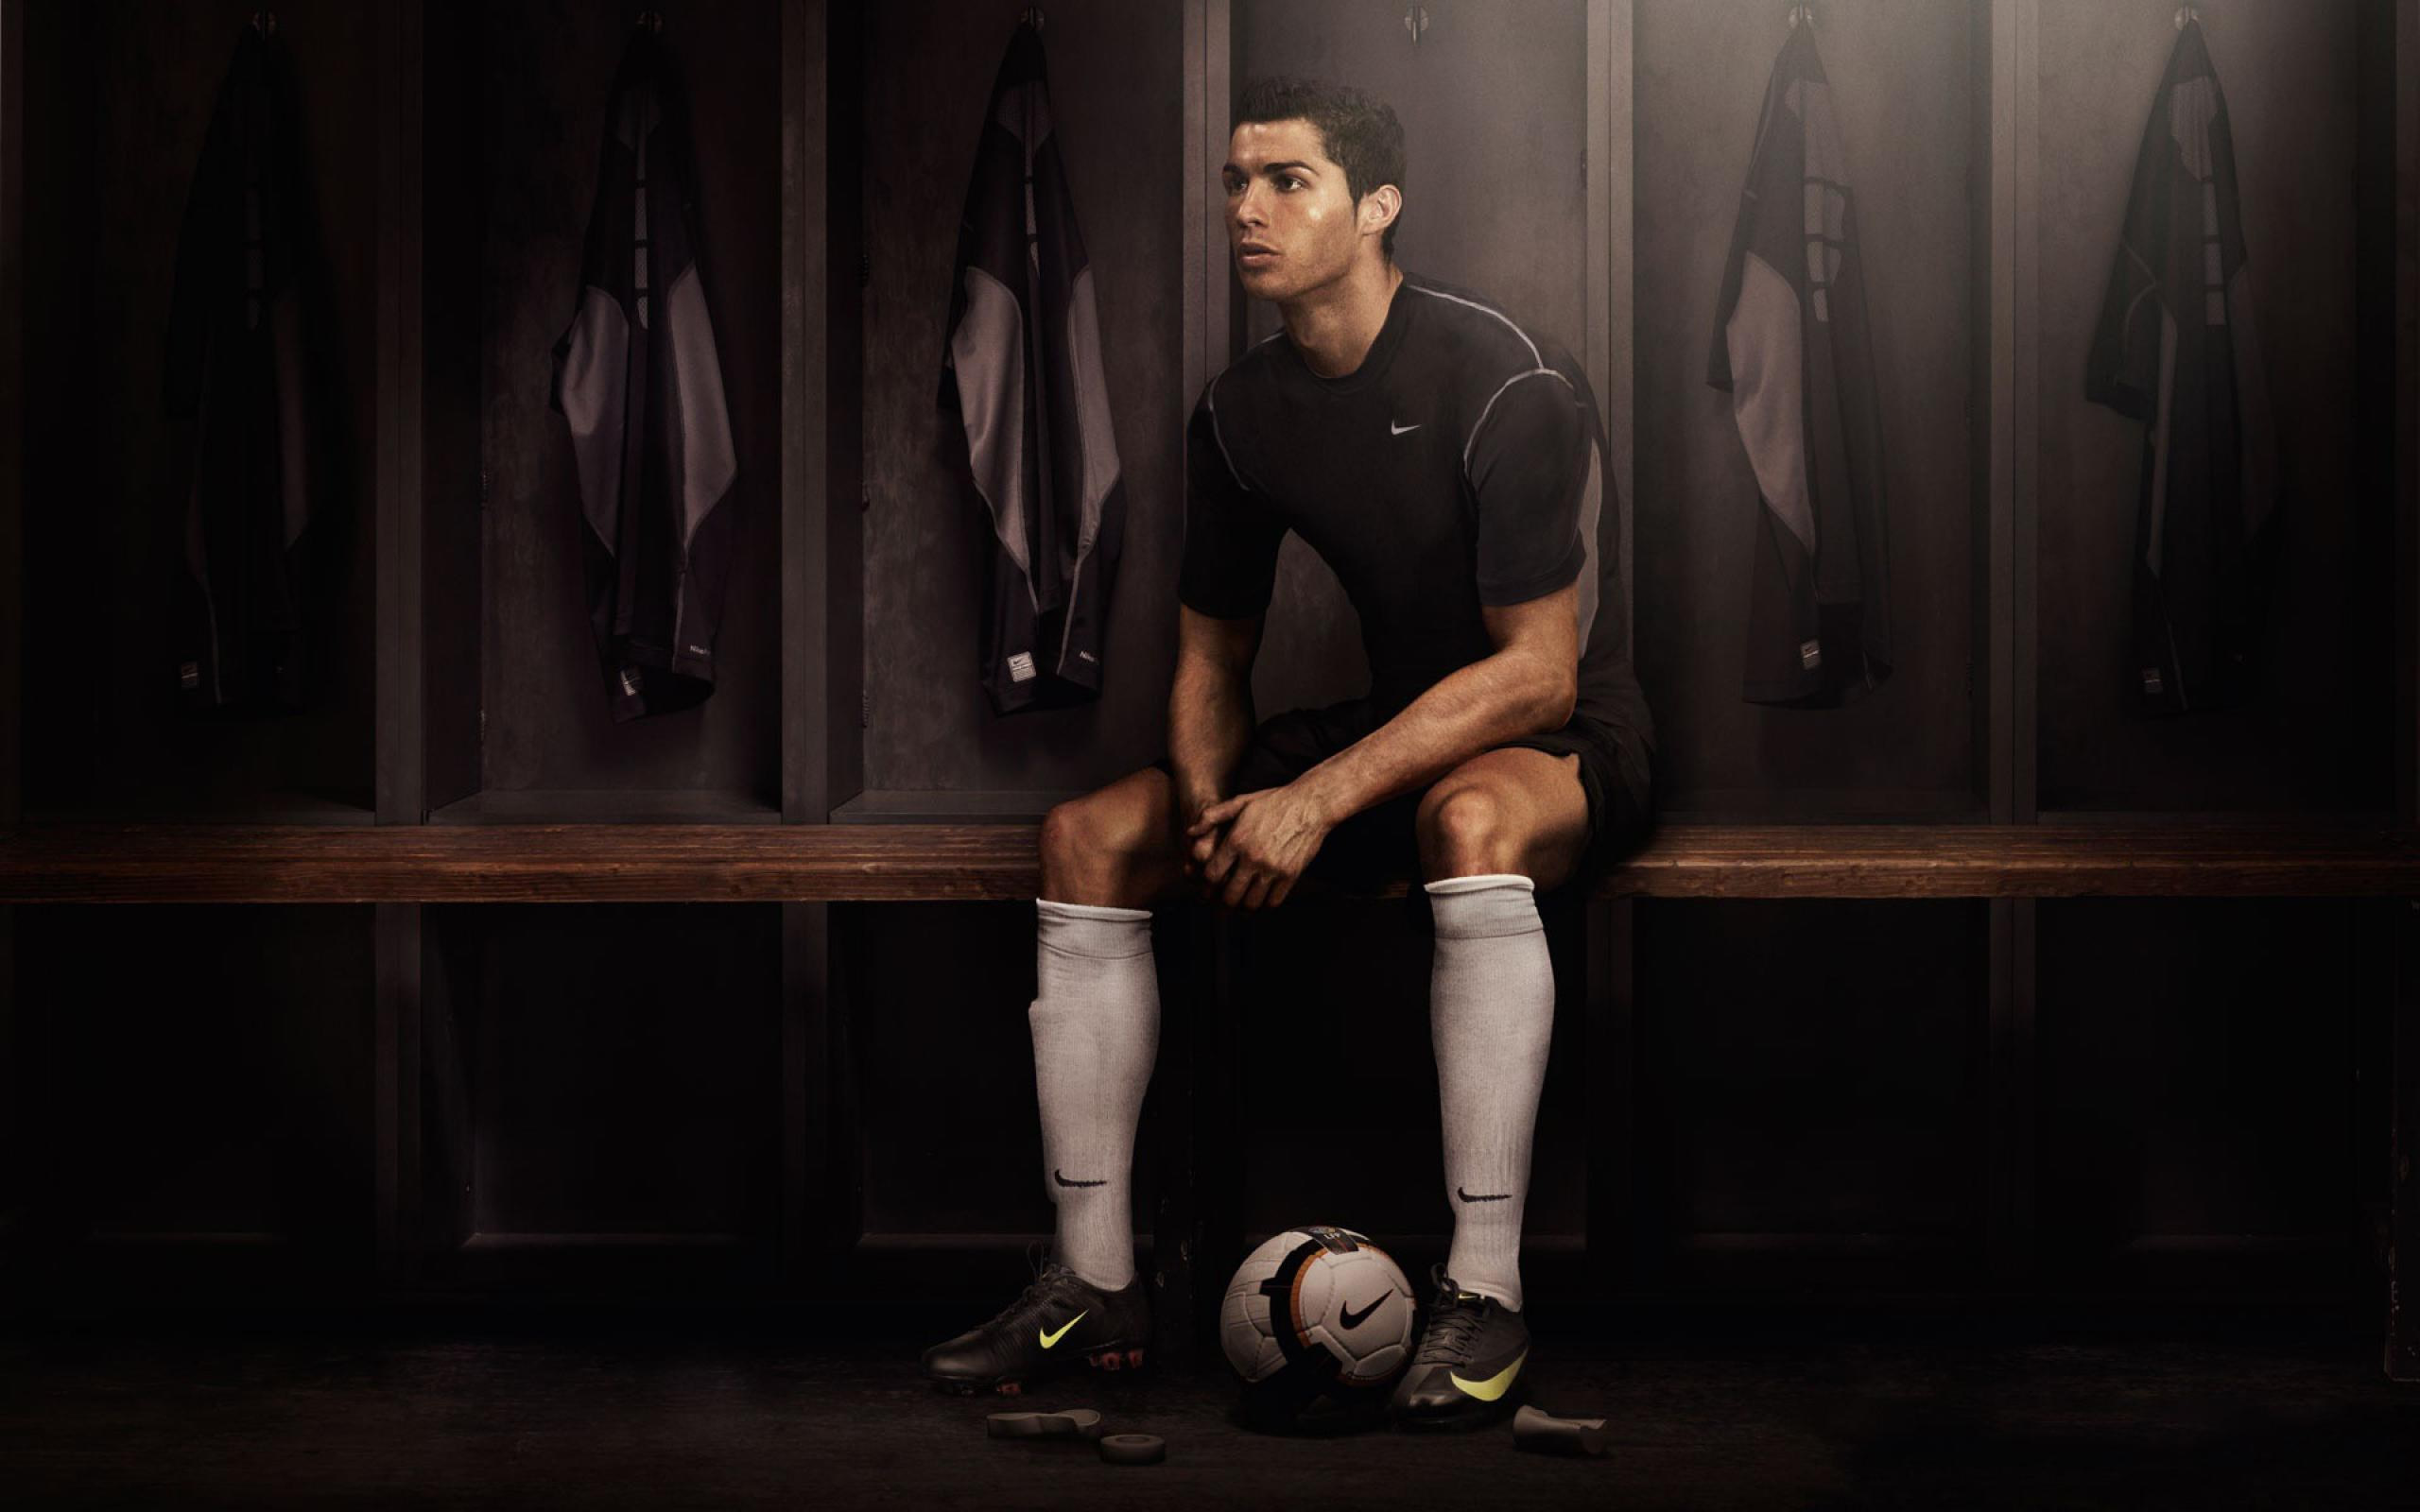 Cristiano Ronaldo Nike wallpaper (2)